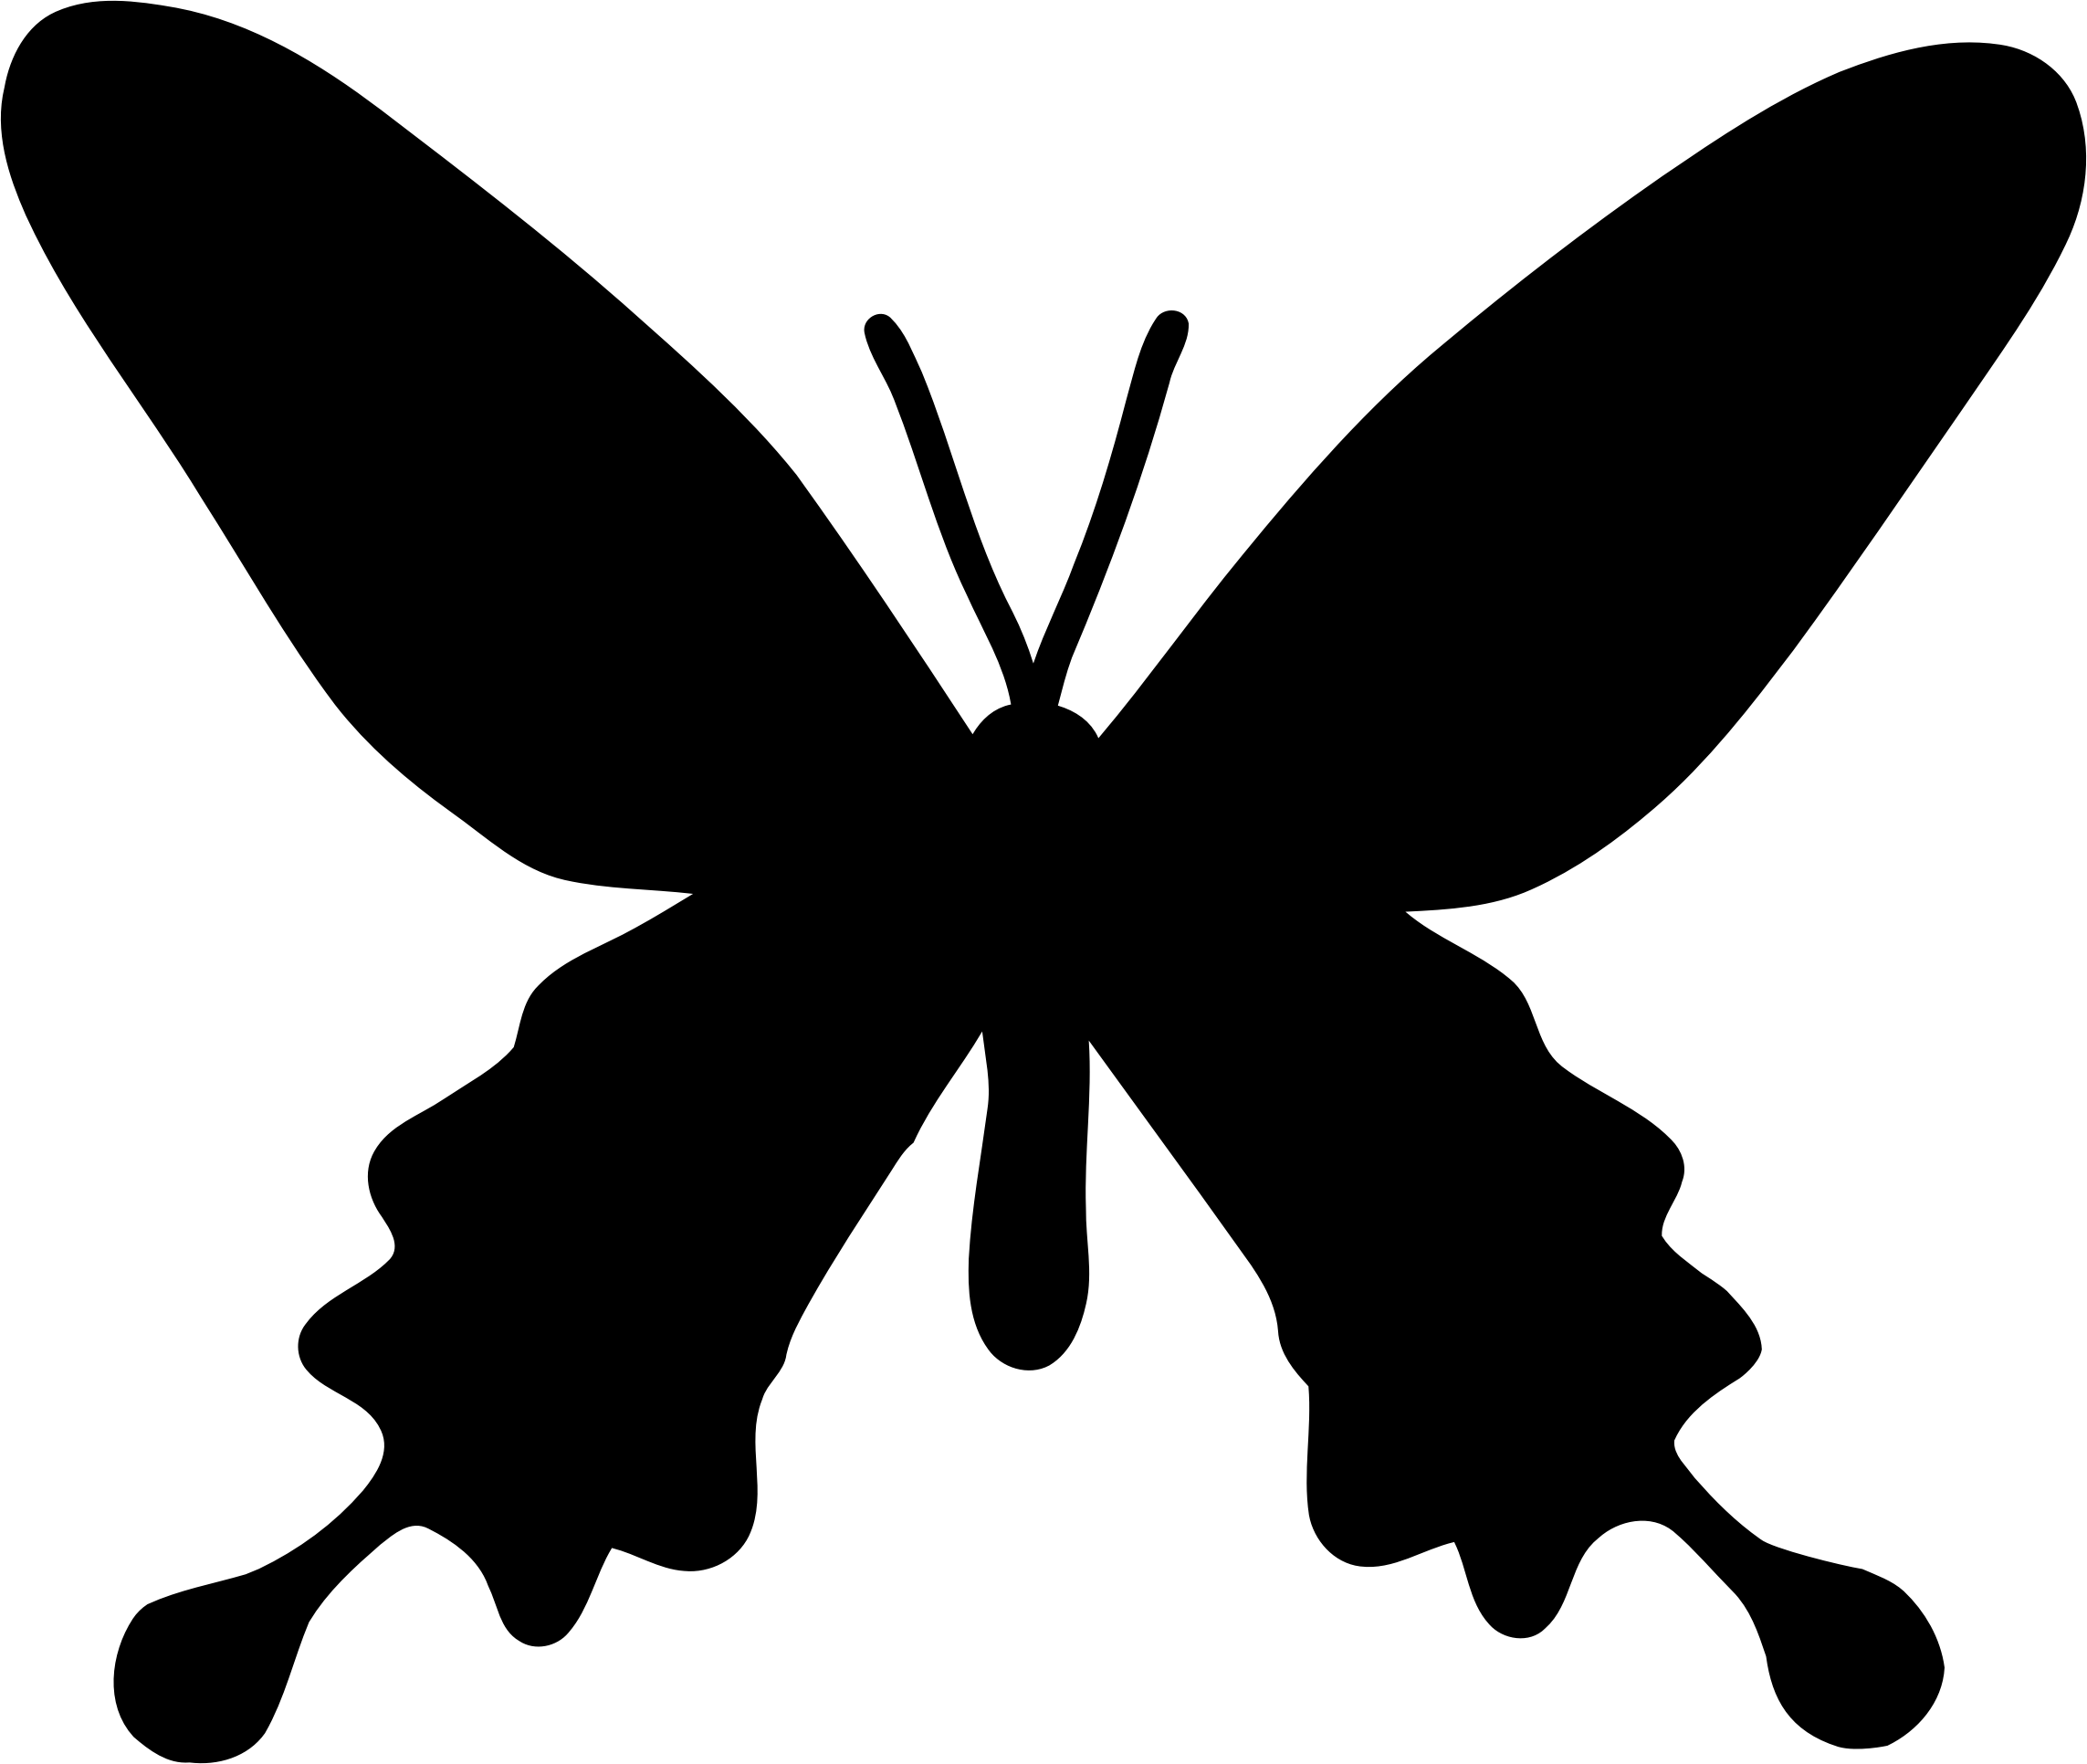 2286x1932 Clipart